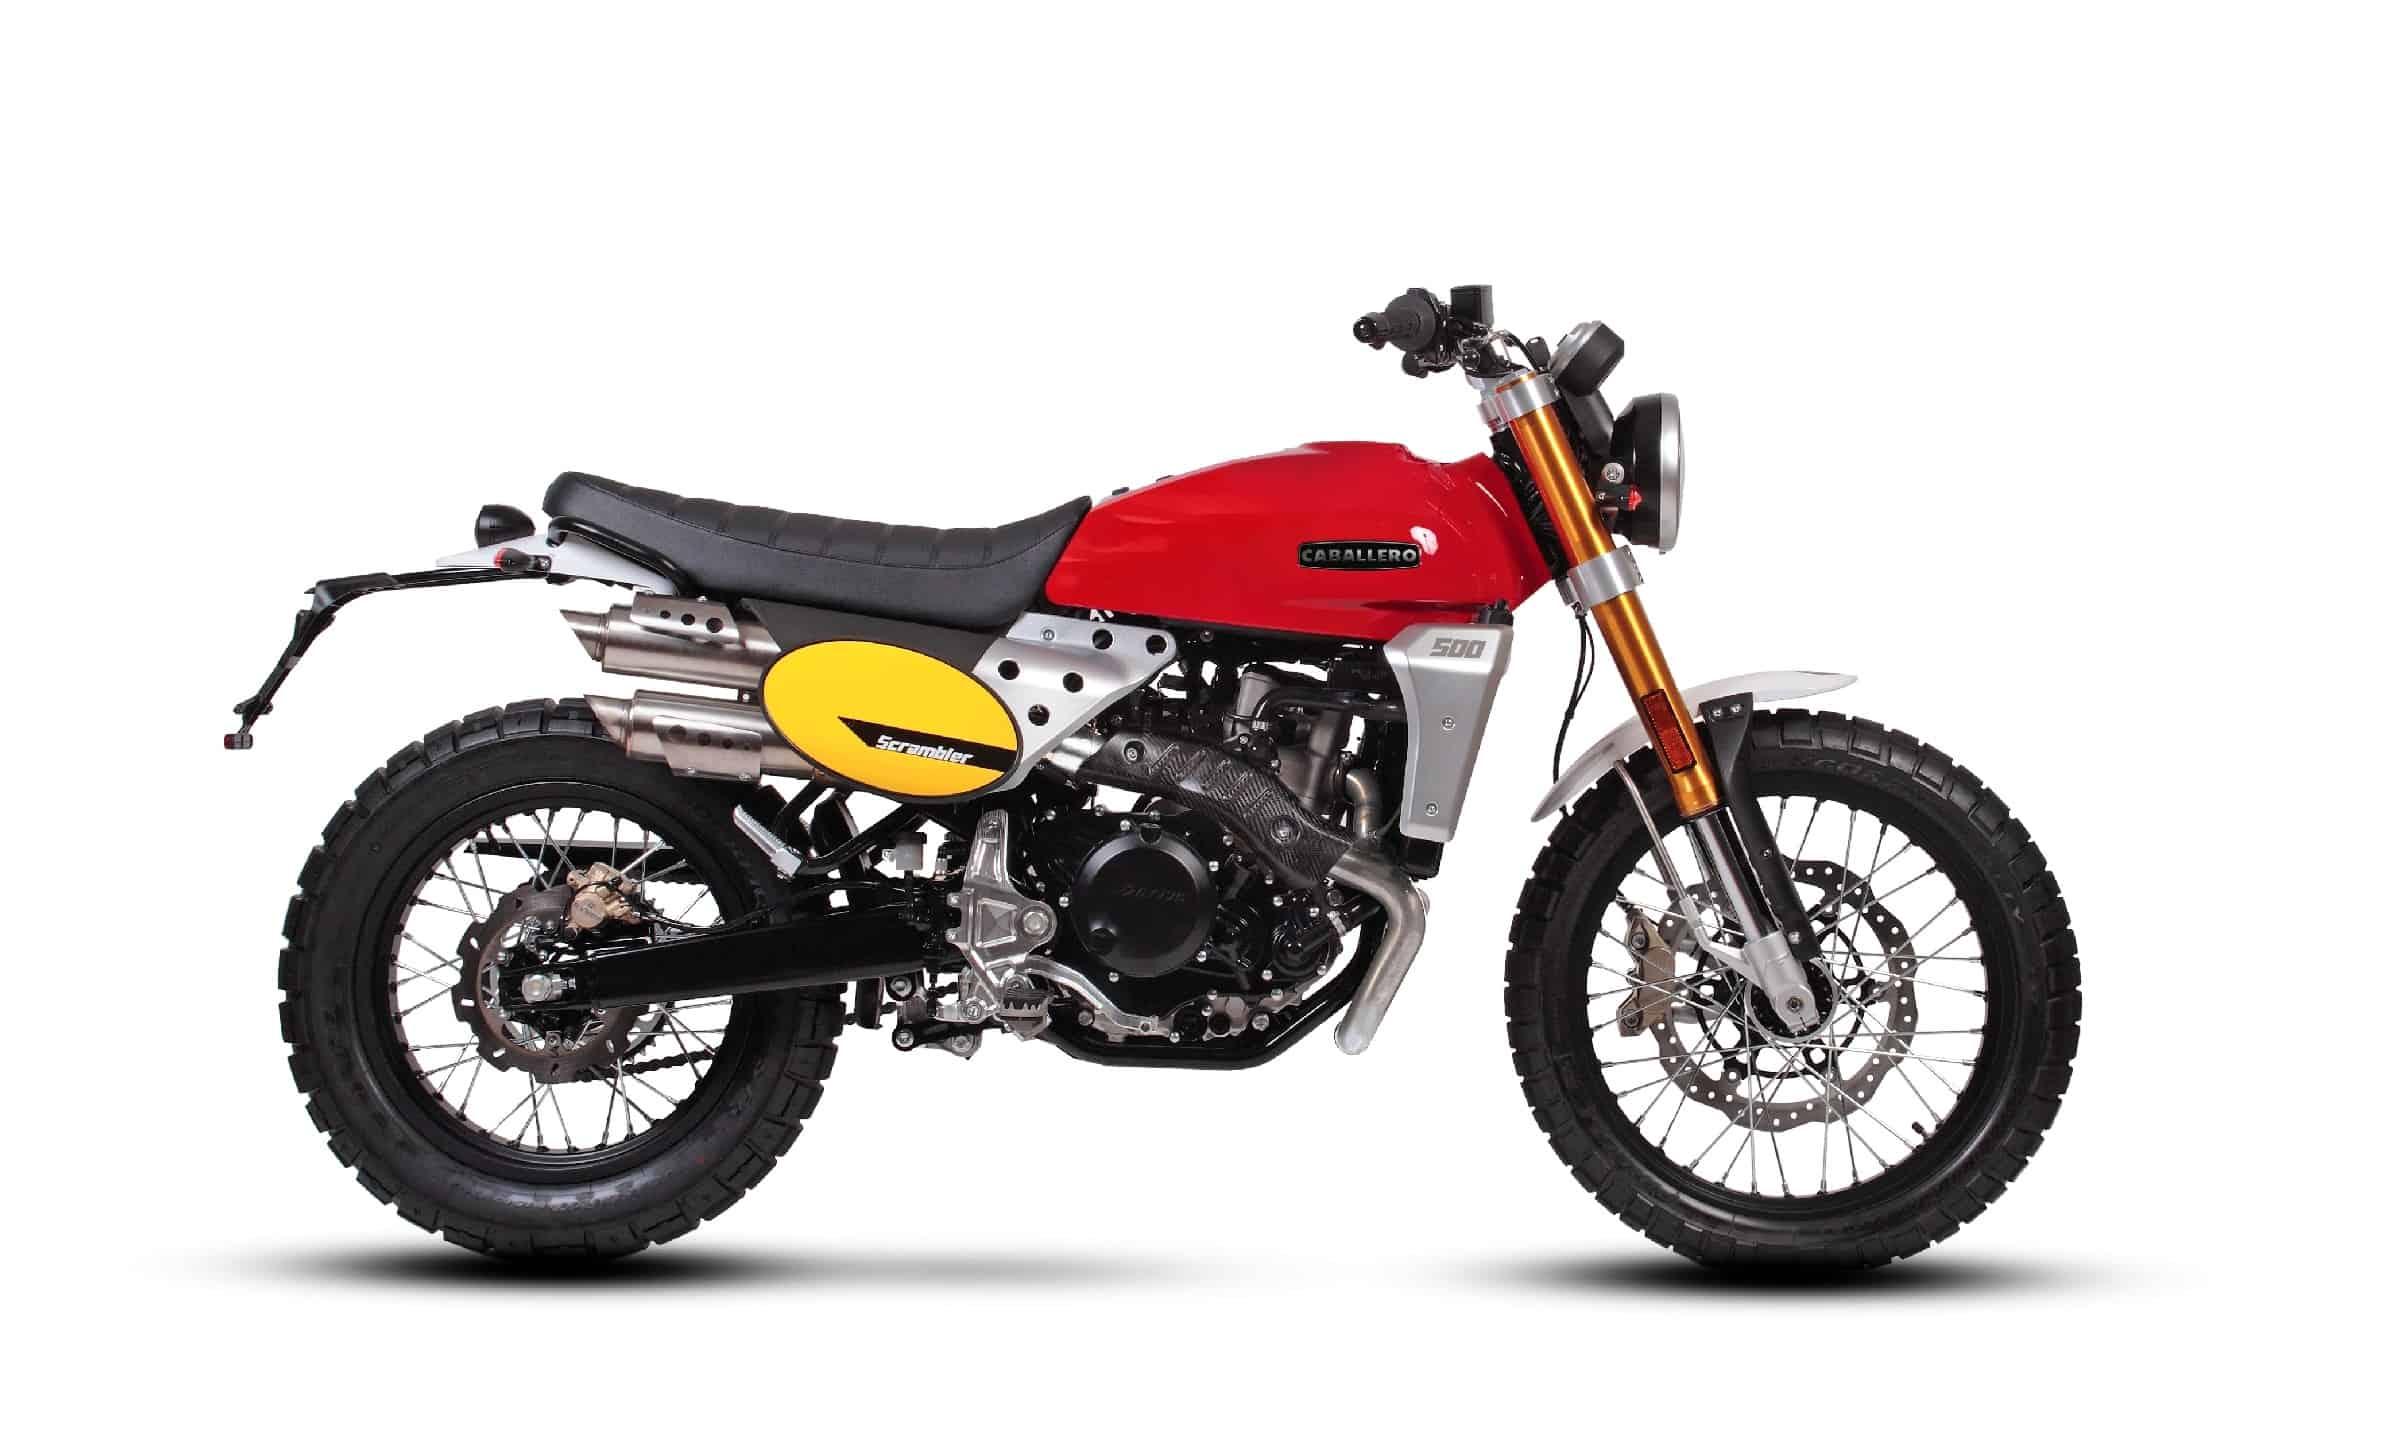 Fantic Scrambler 500cc - Cabarello | Fantic Motor Norge